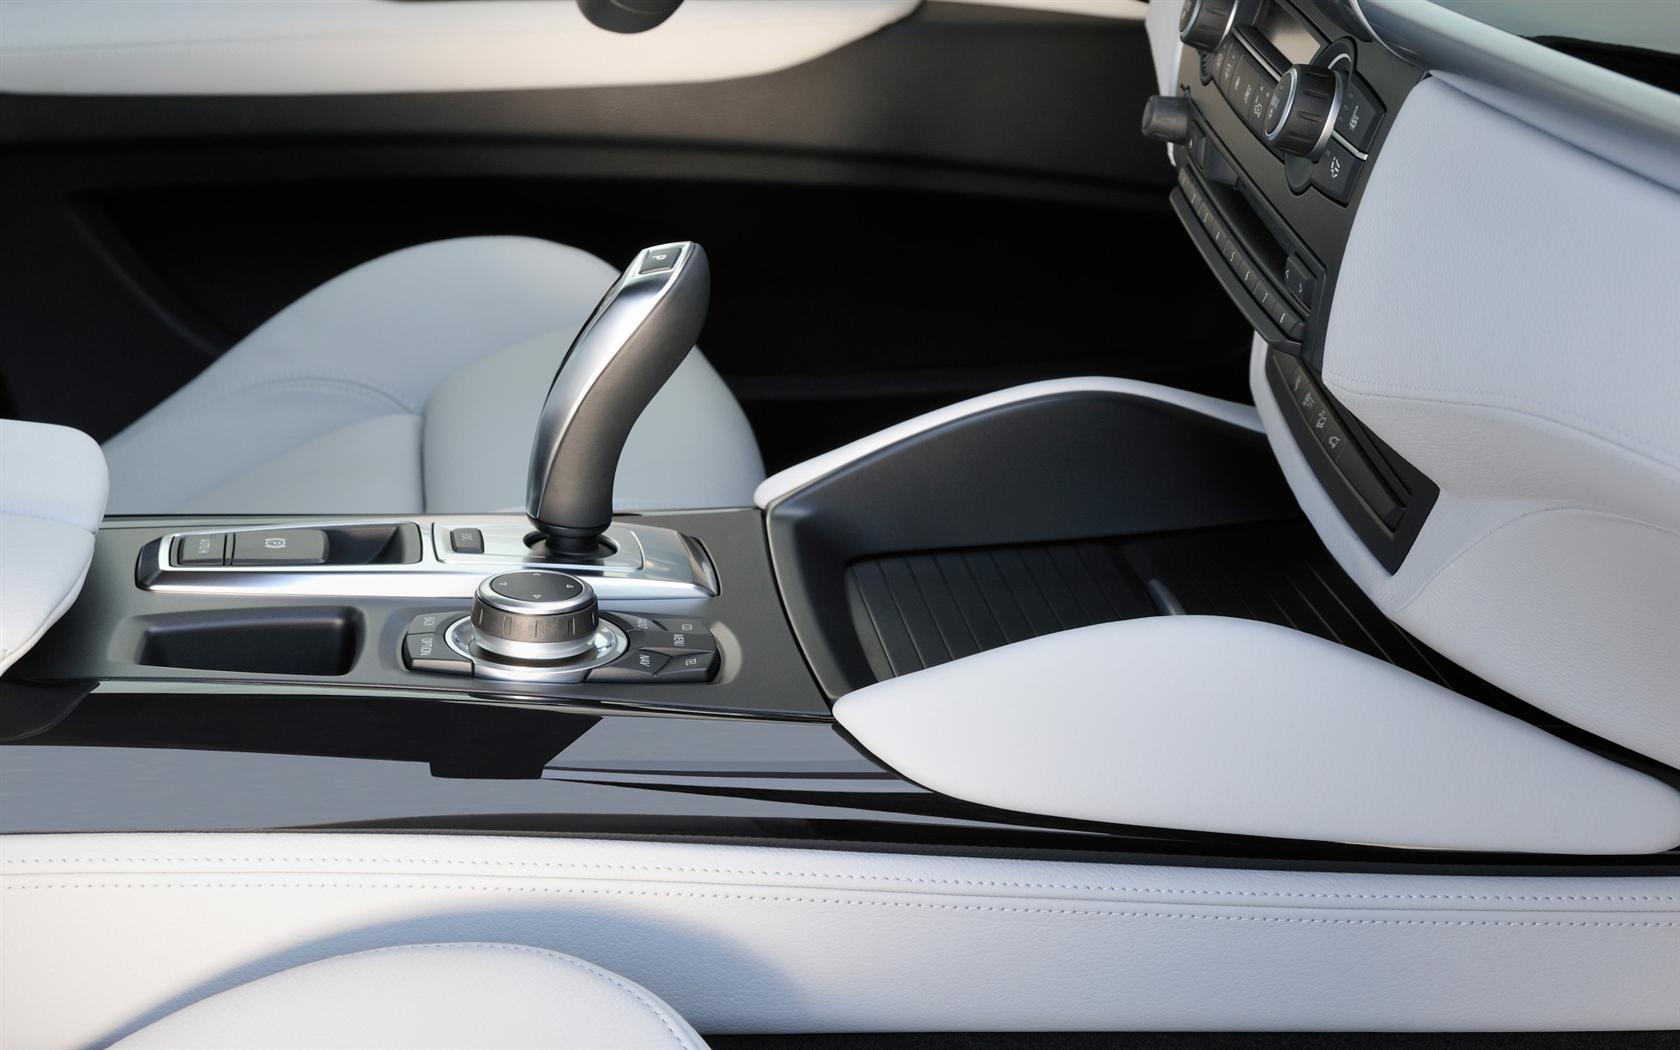 2010 BMW X5 M Image